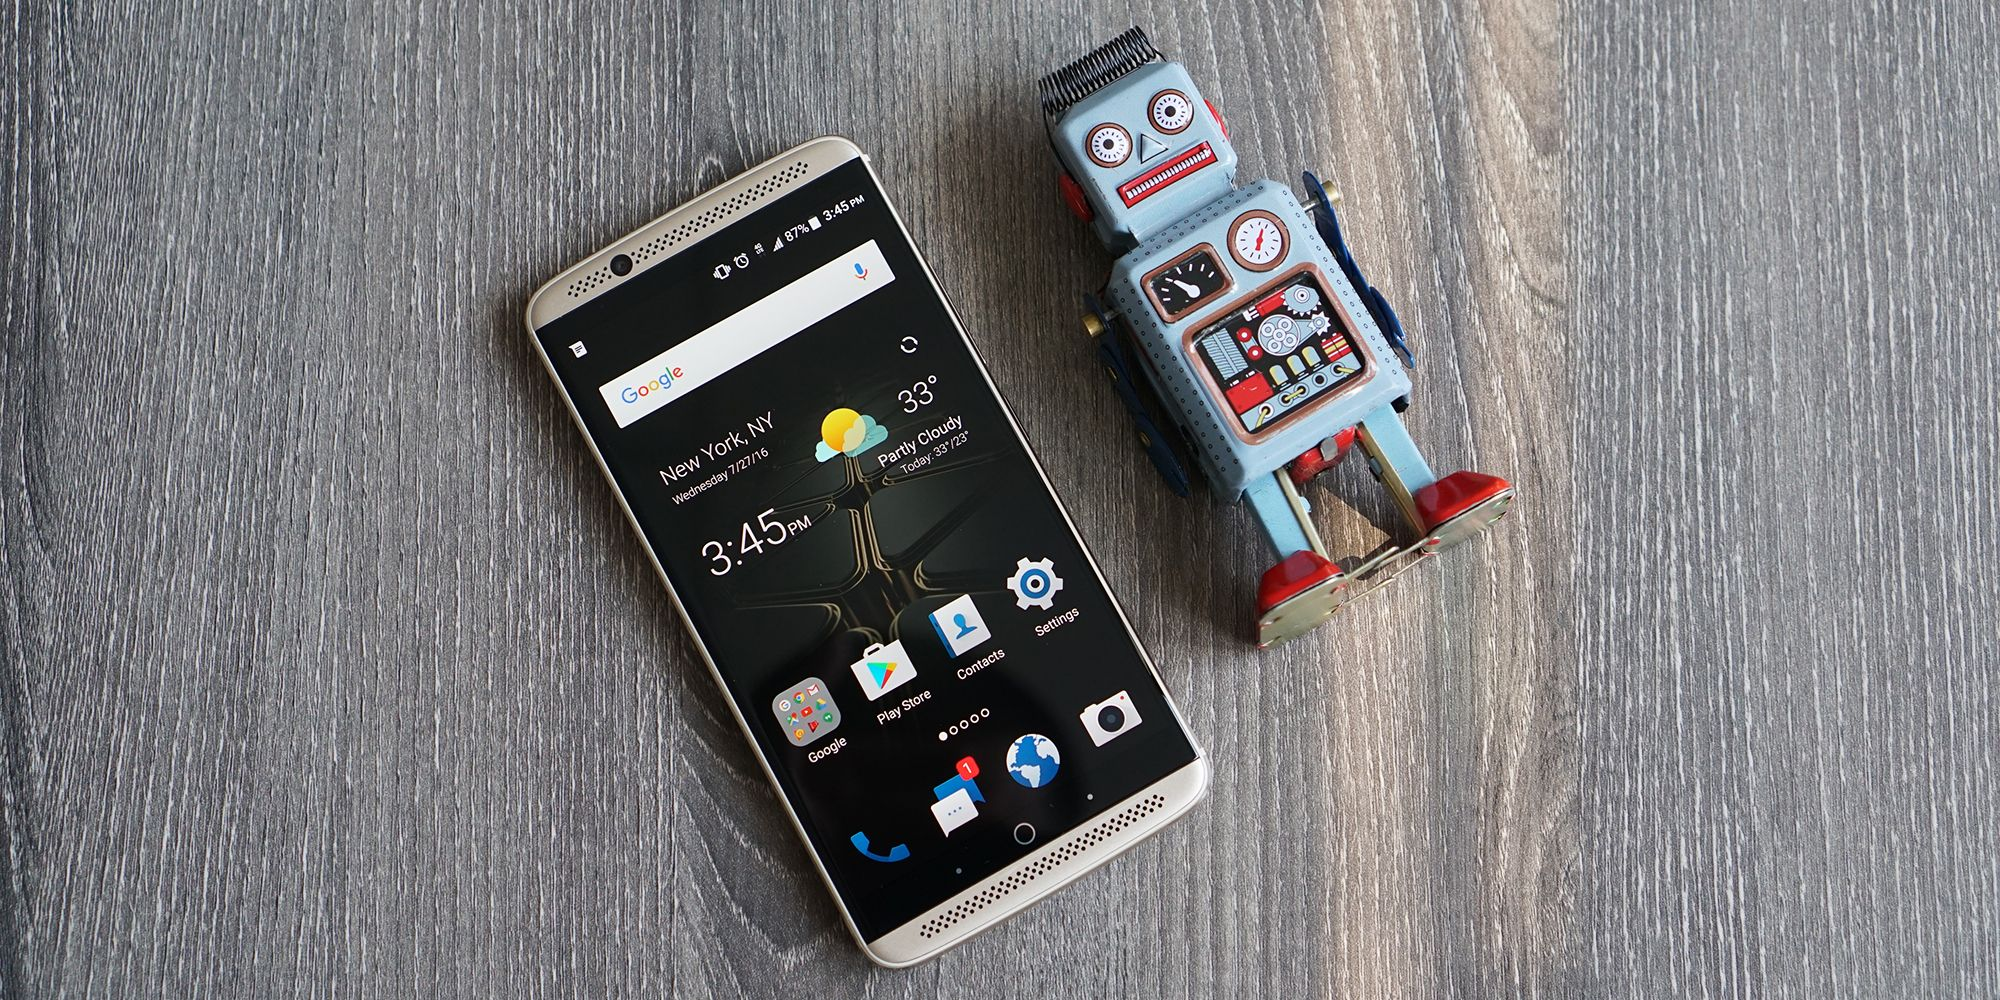 ZTE Axon 7 Smartphone Review 2018